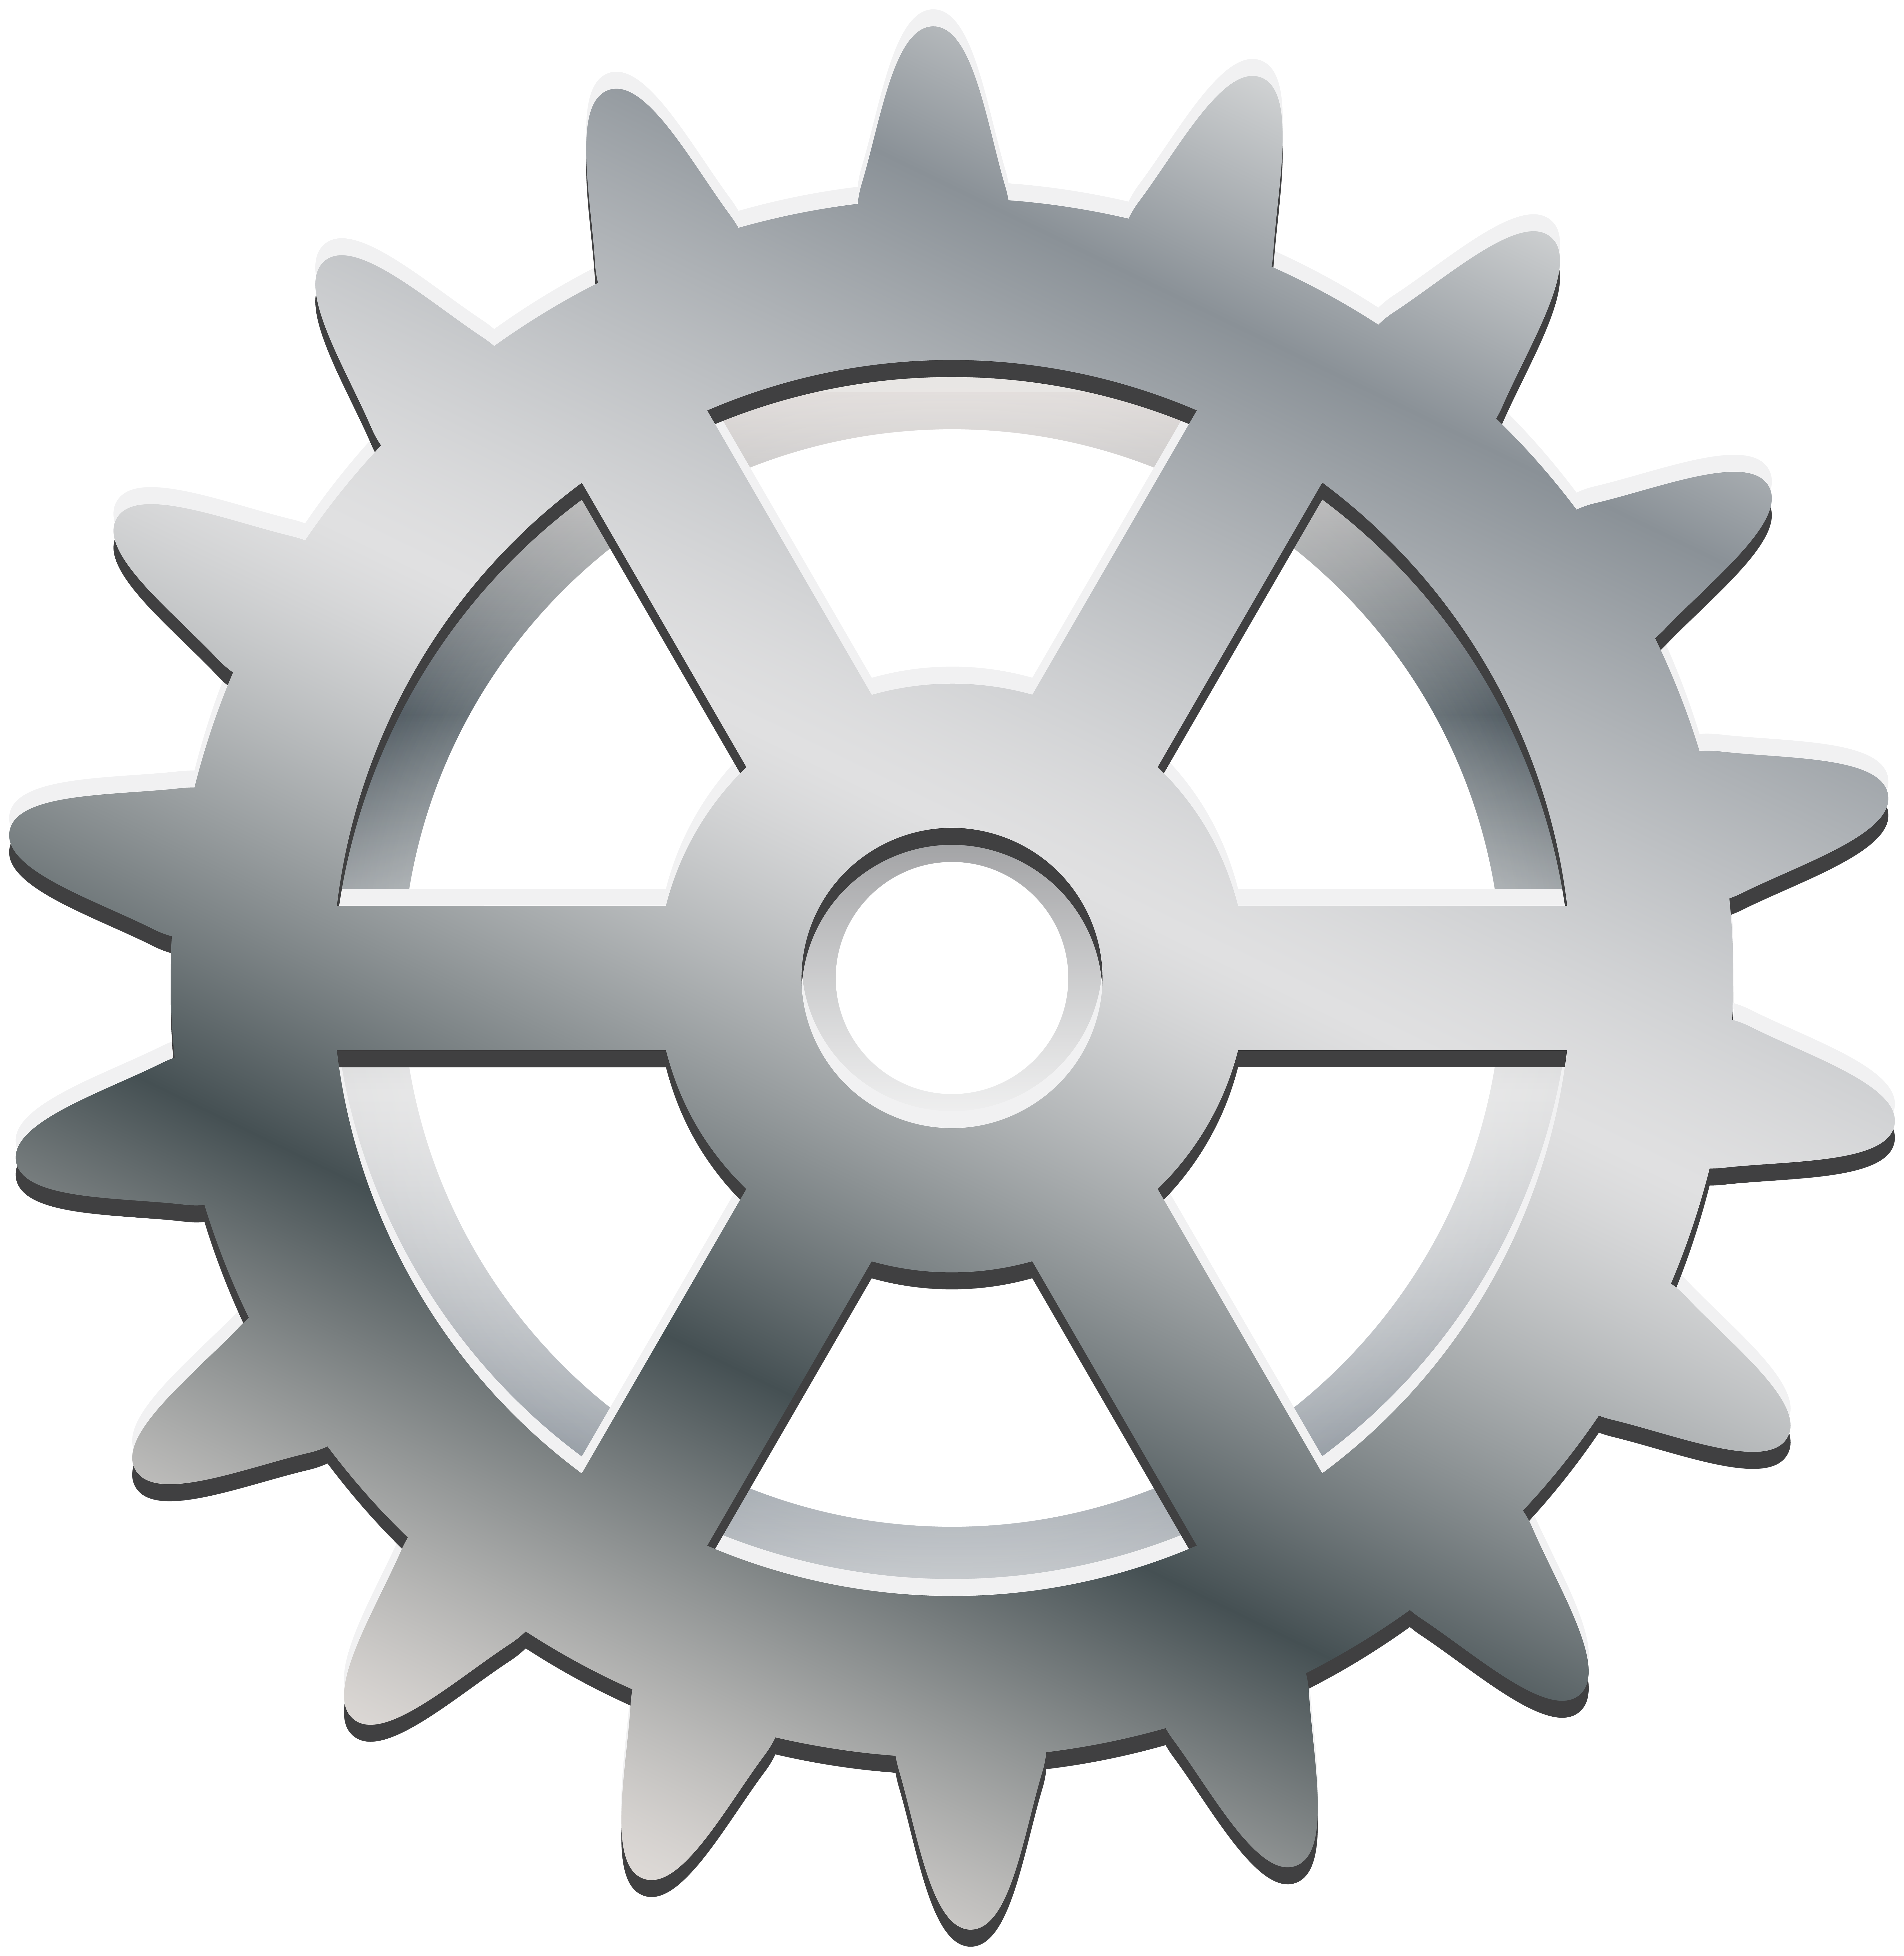 Wheel clipart hubcap. Silver gear transparent png